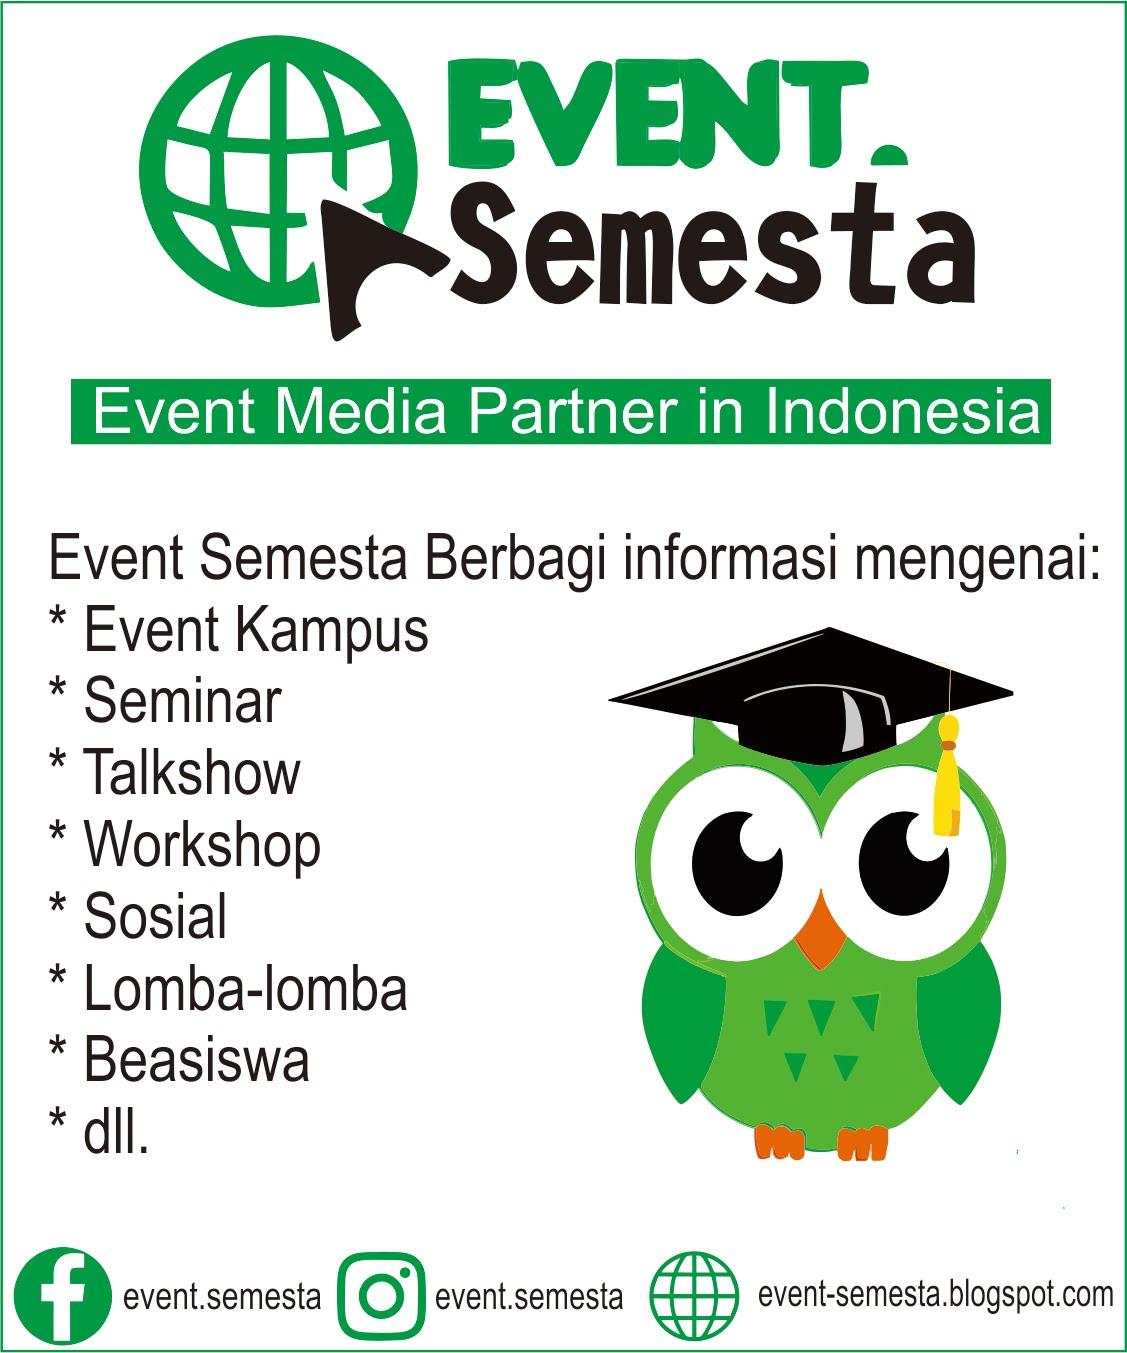 Event Semesta